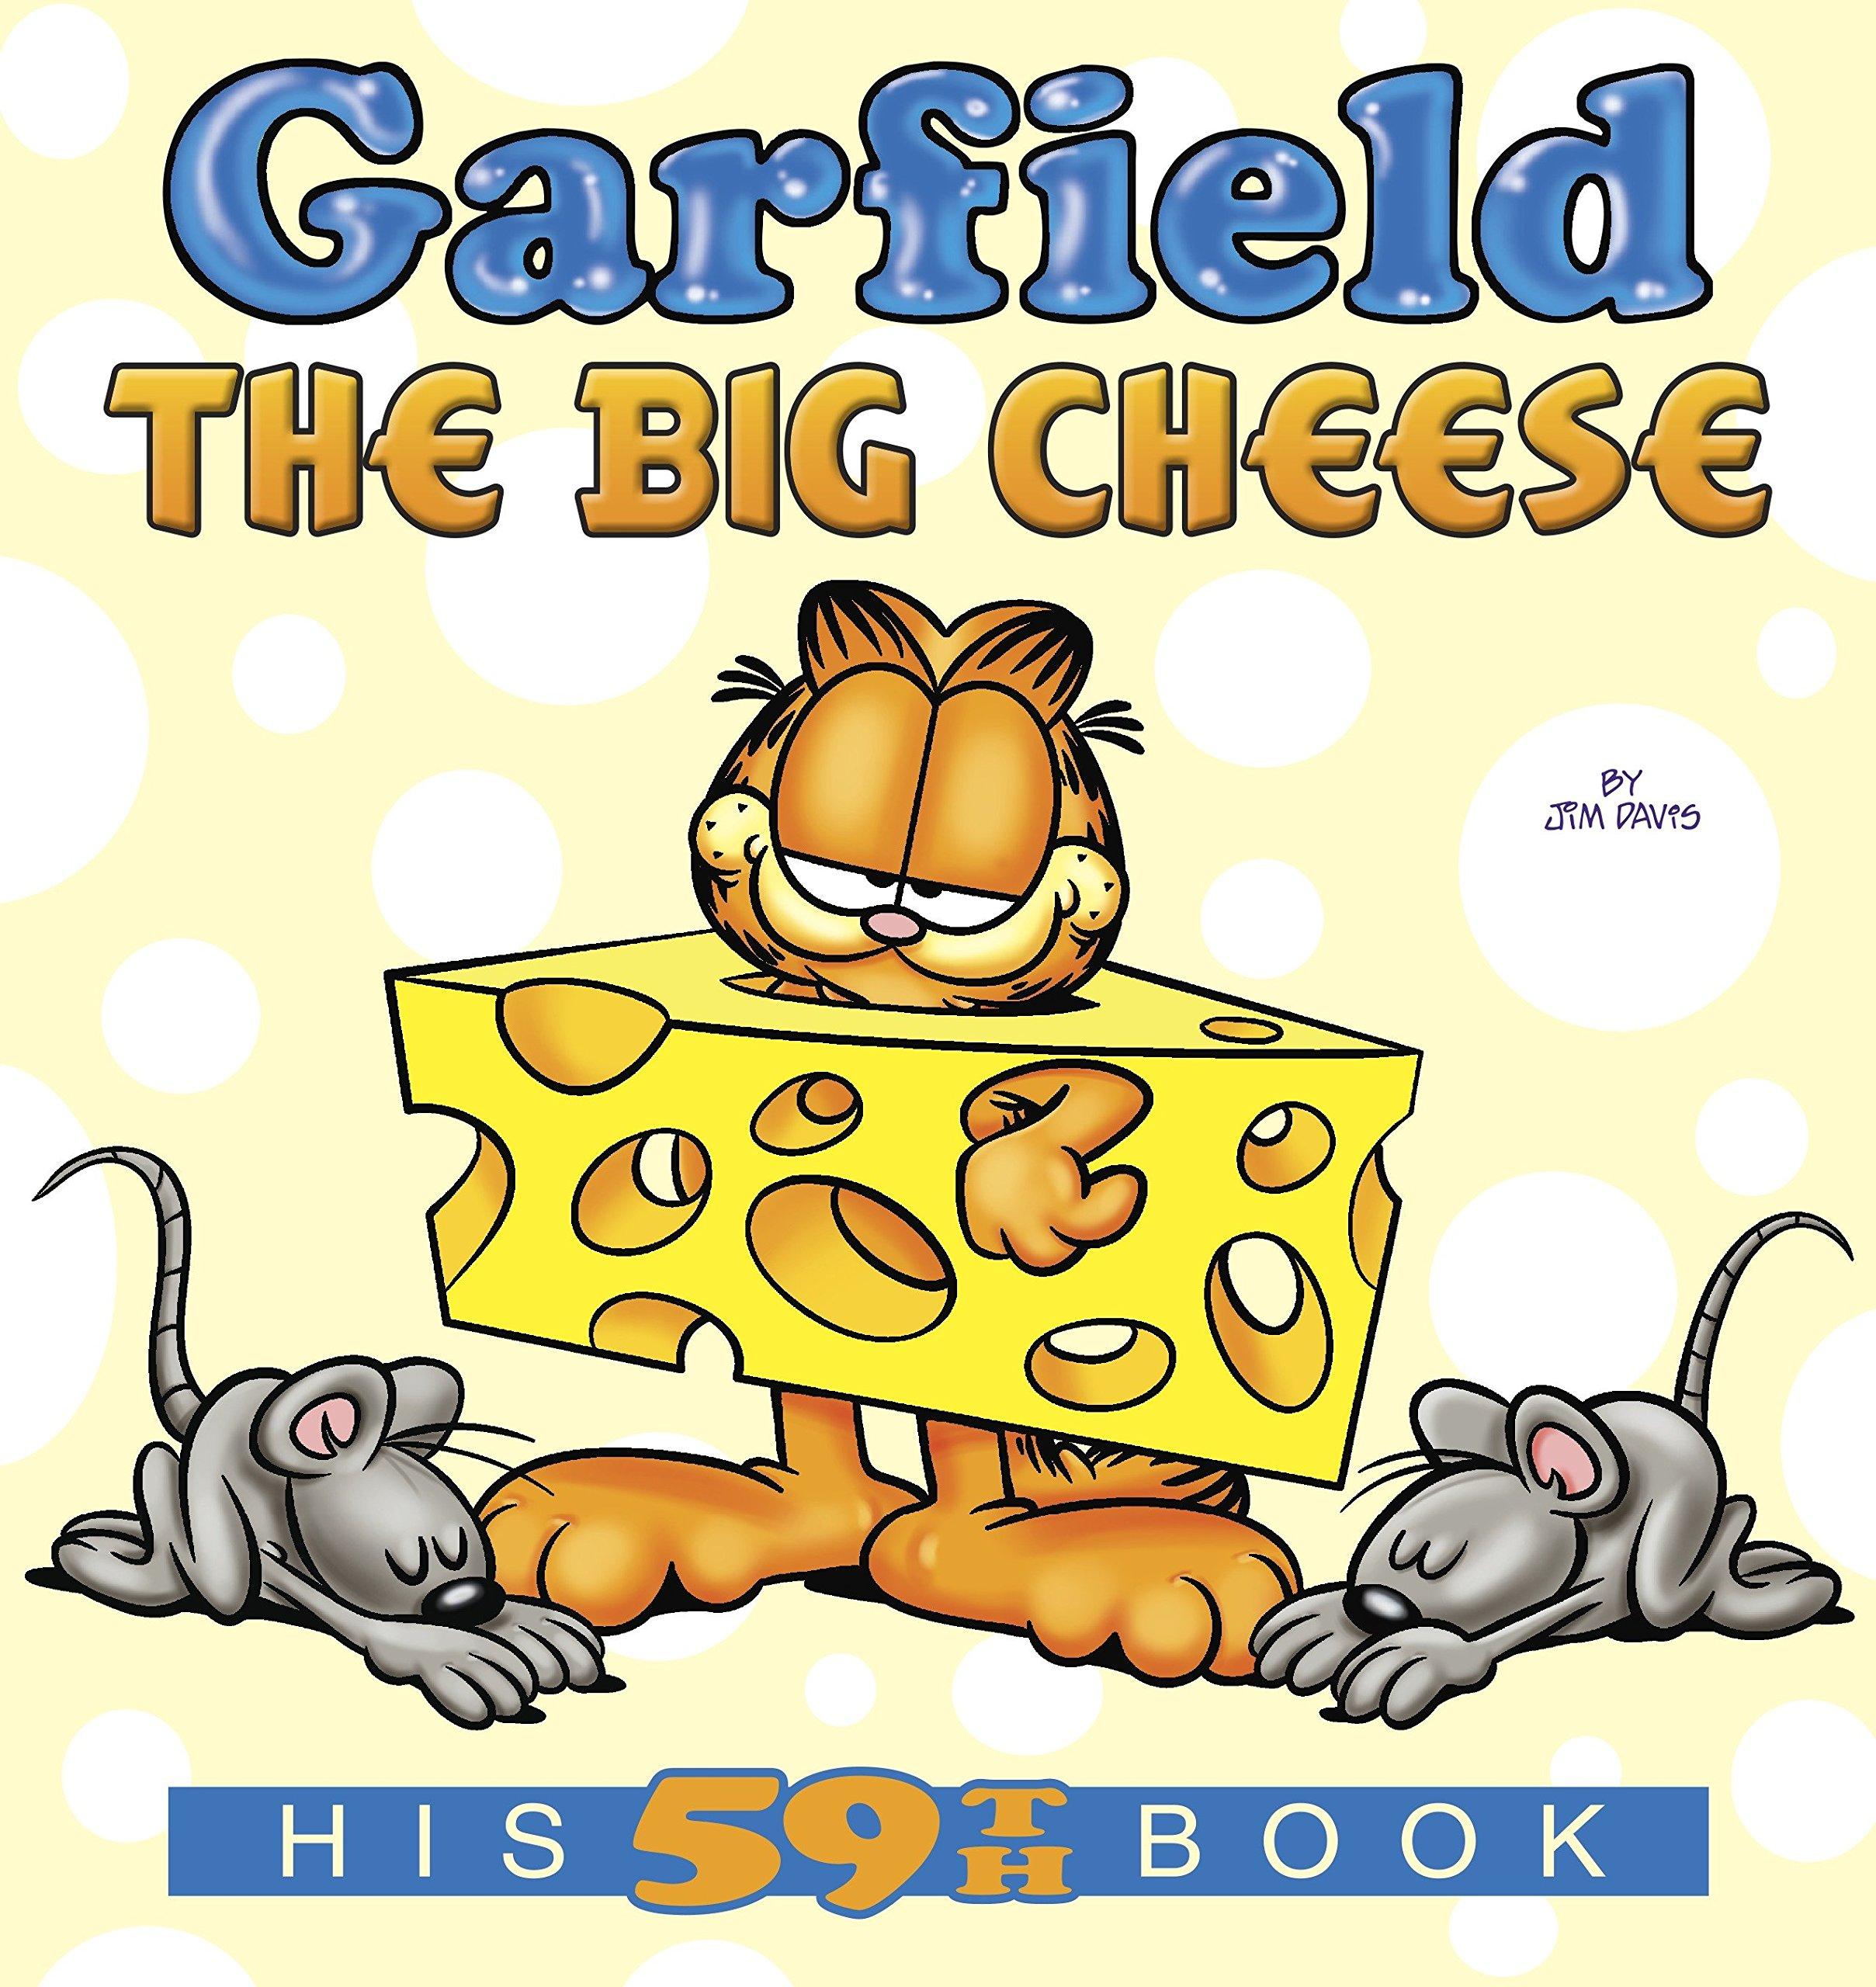 Garfield: The Big Cheese